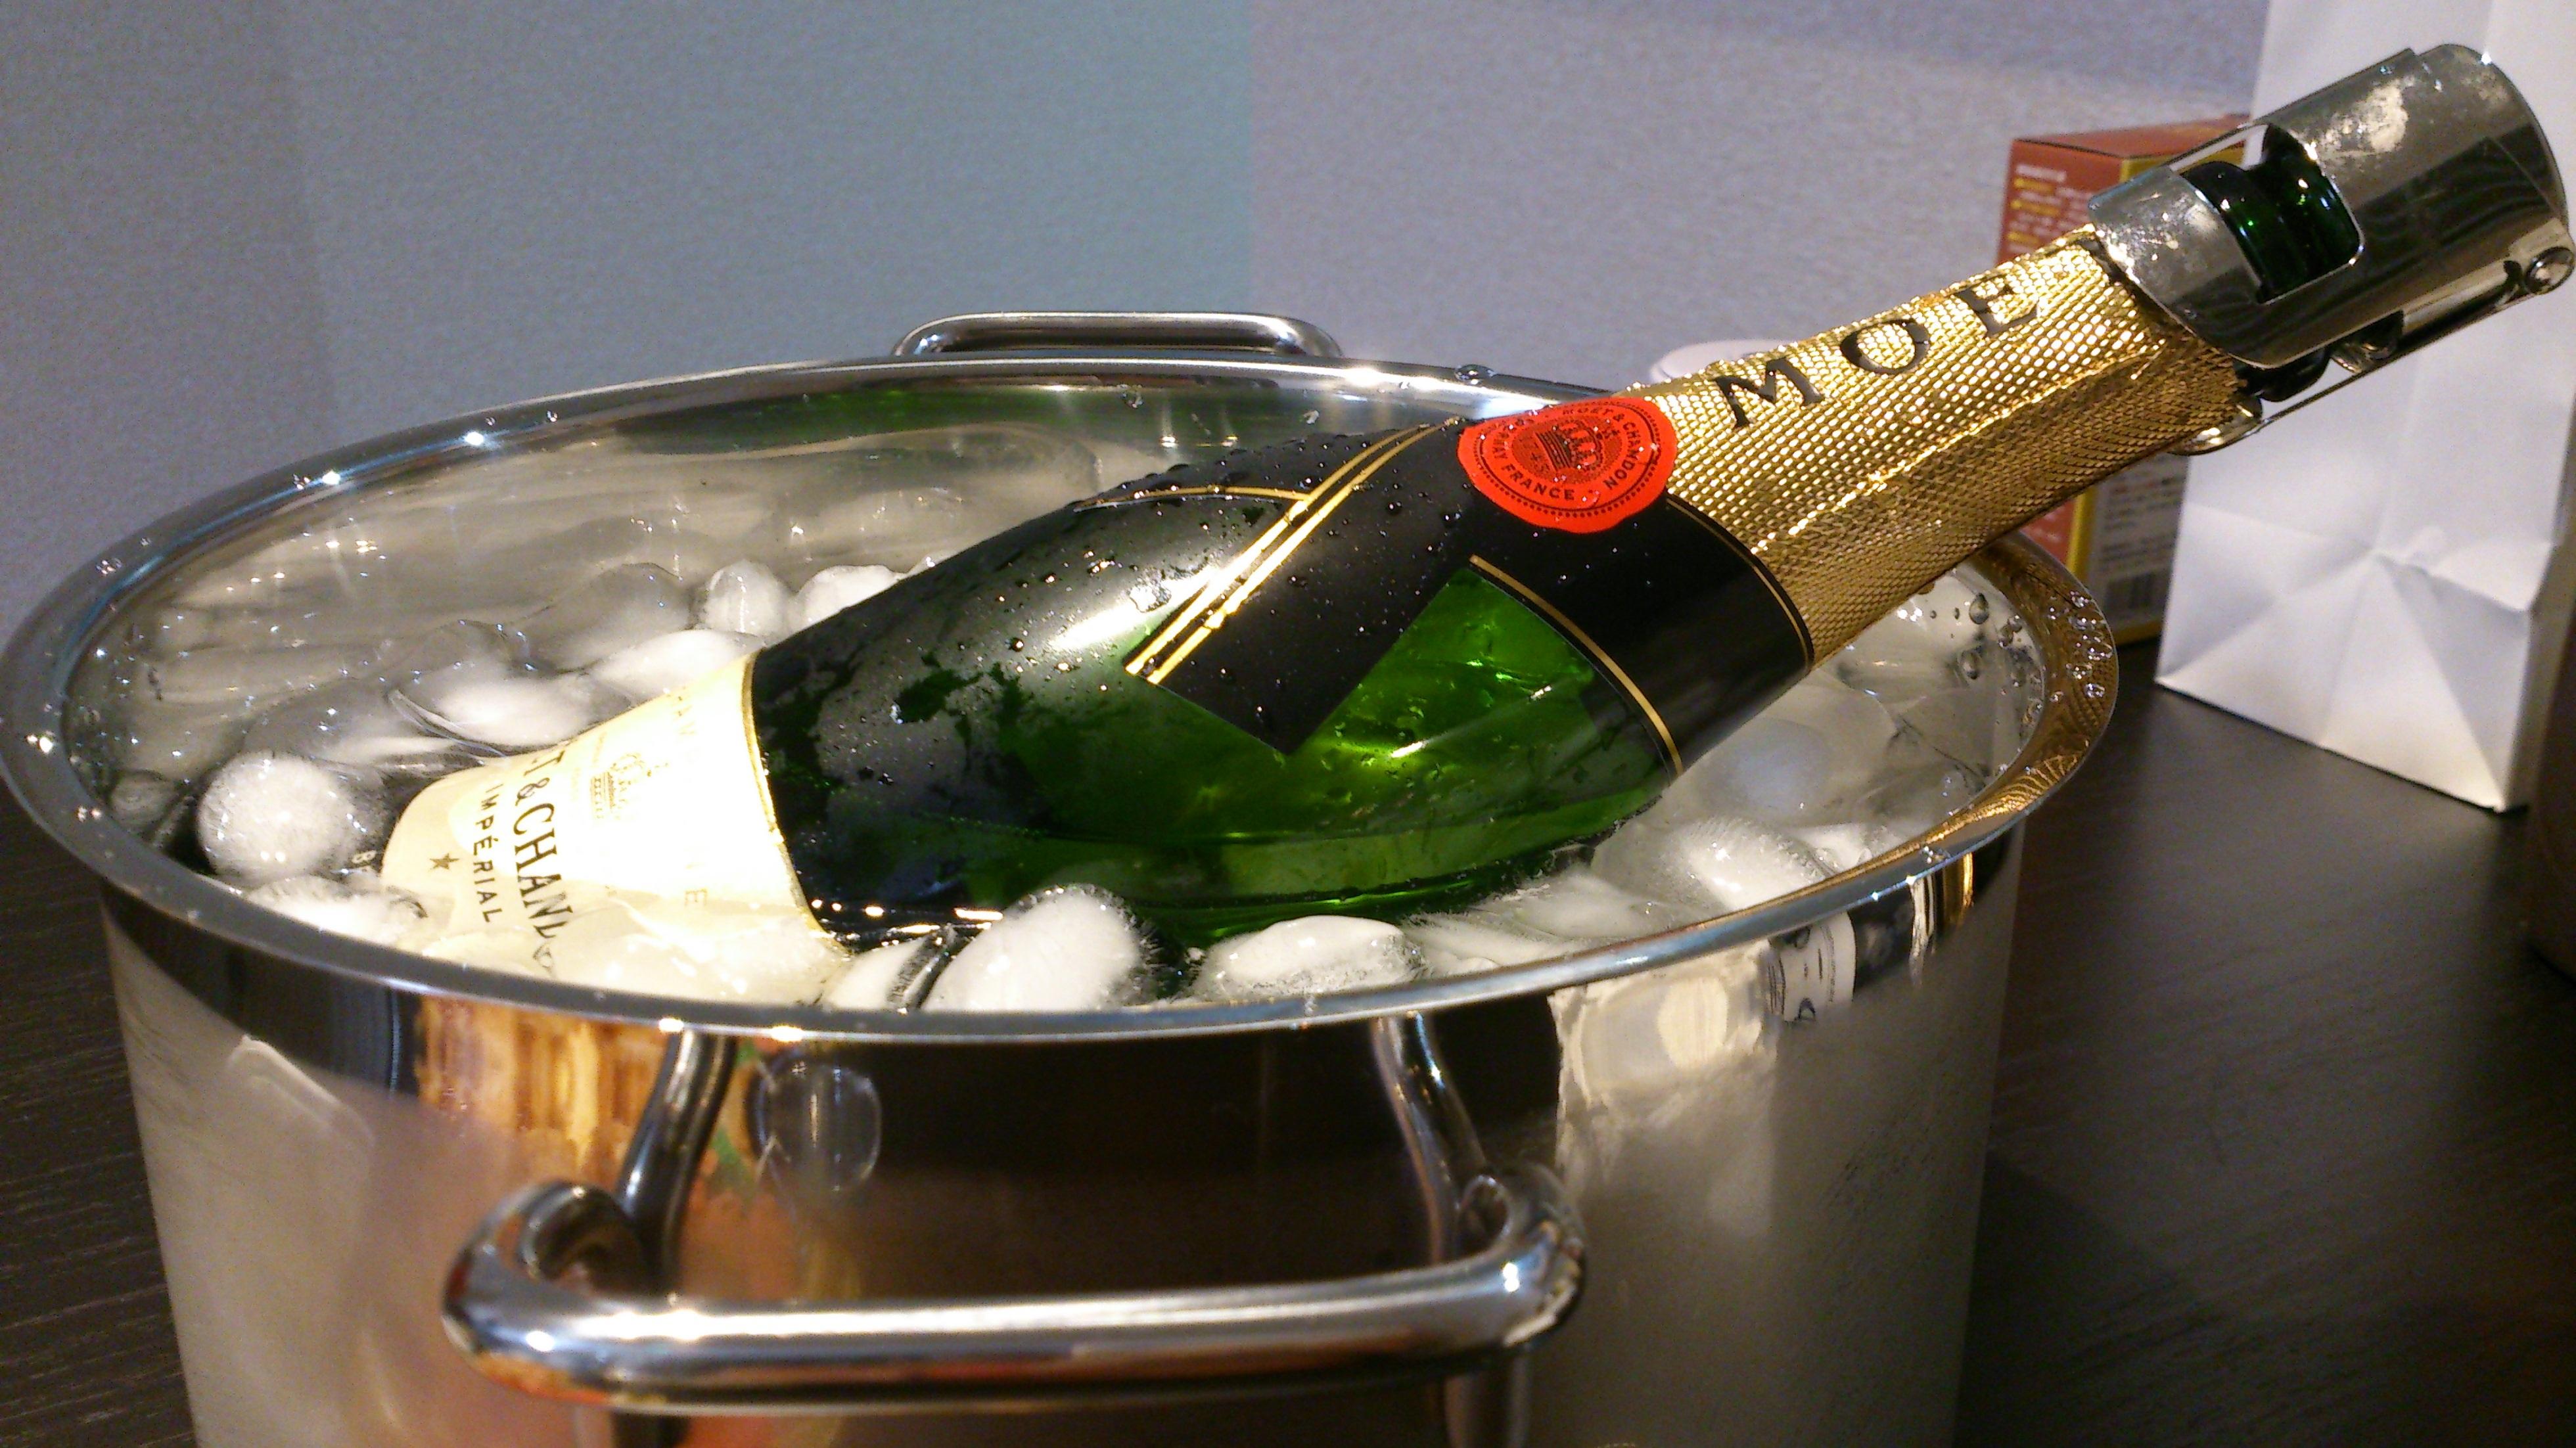 Картинки бутылка шампанского на столе